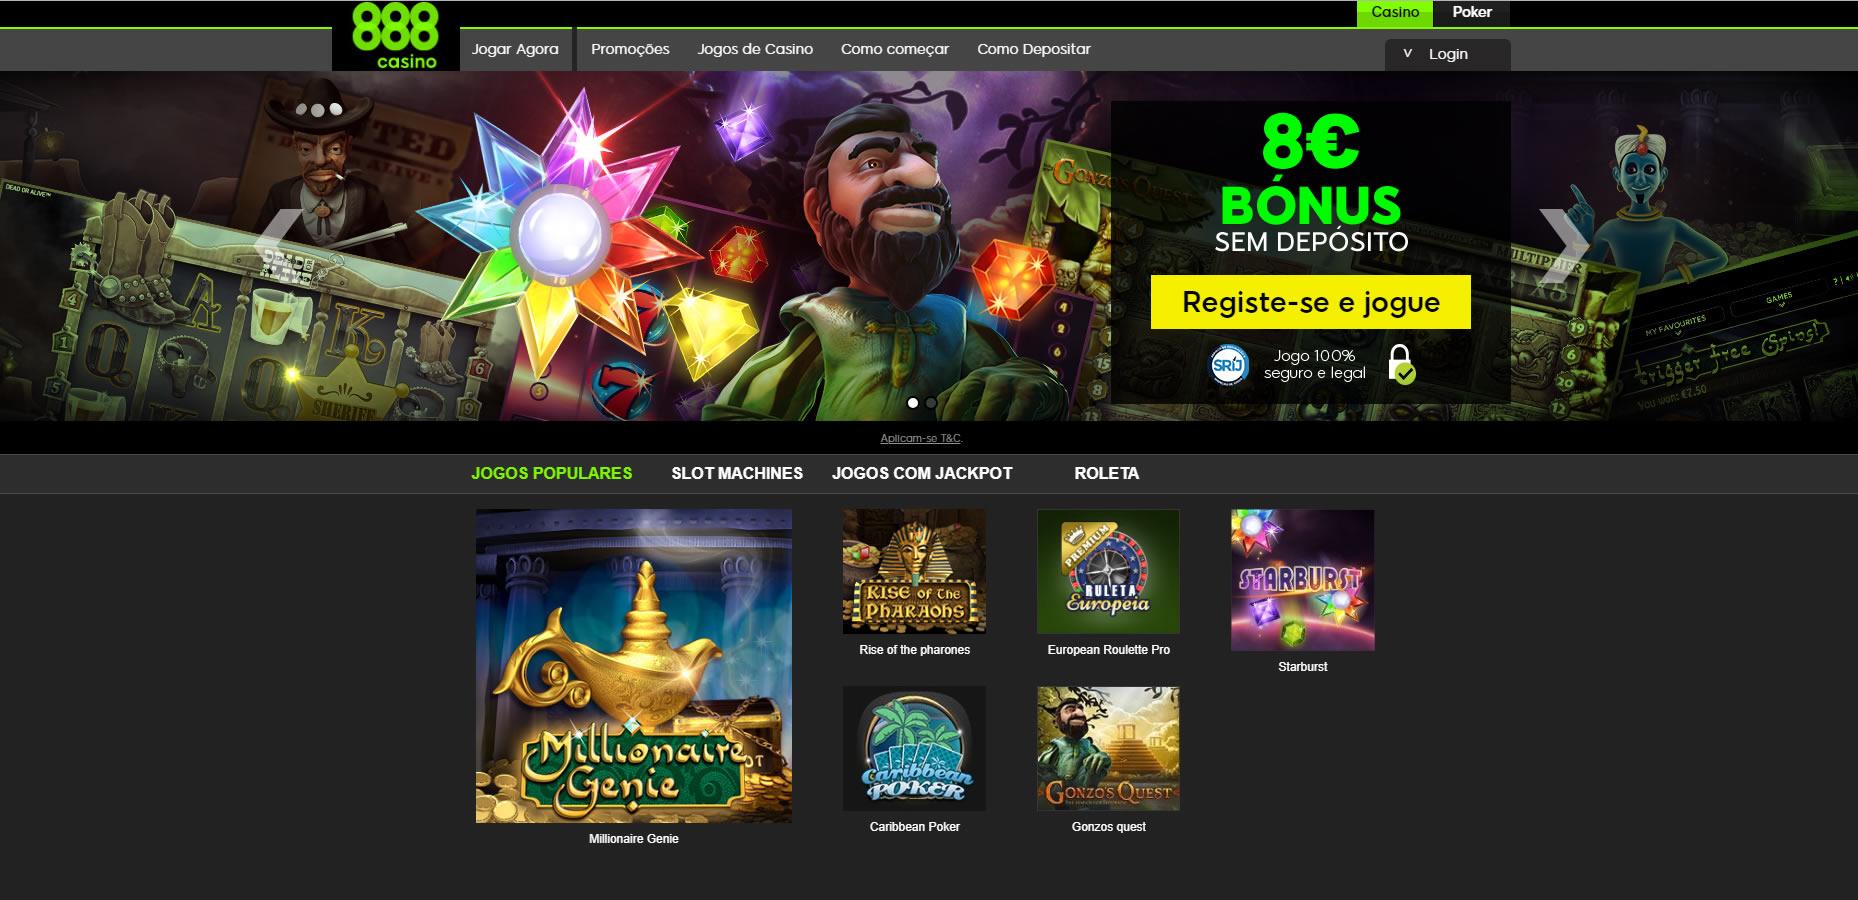 casino slot games for sale